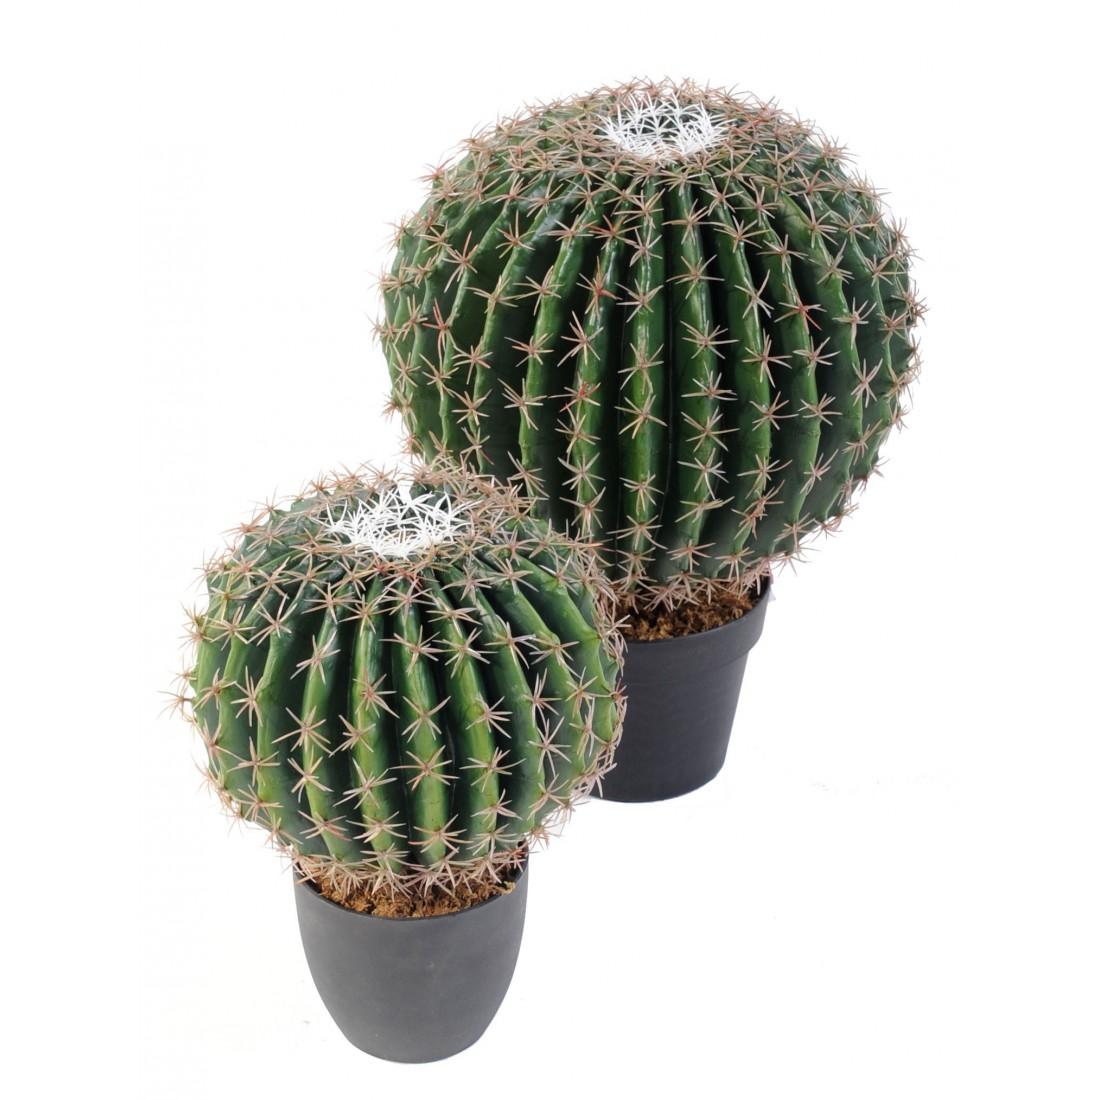 Cactus artificiel echino diam 20 ou 30 cm ou golden barrel for Mini cactus artificiel